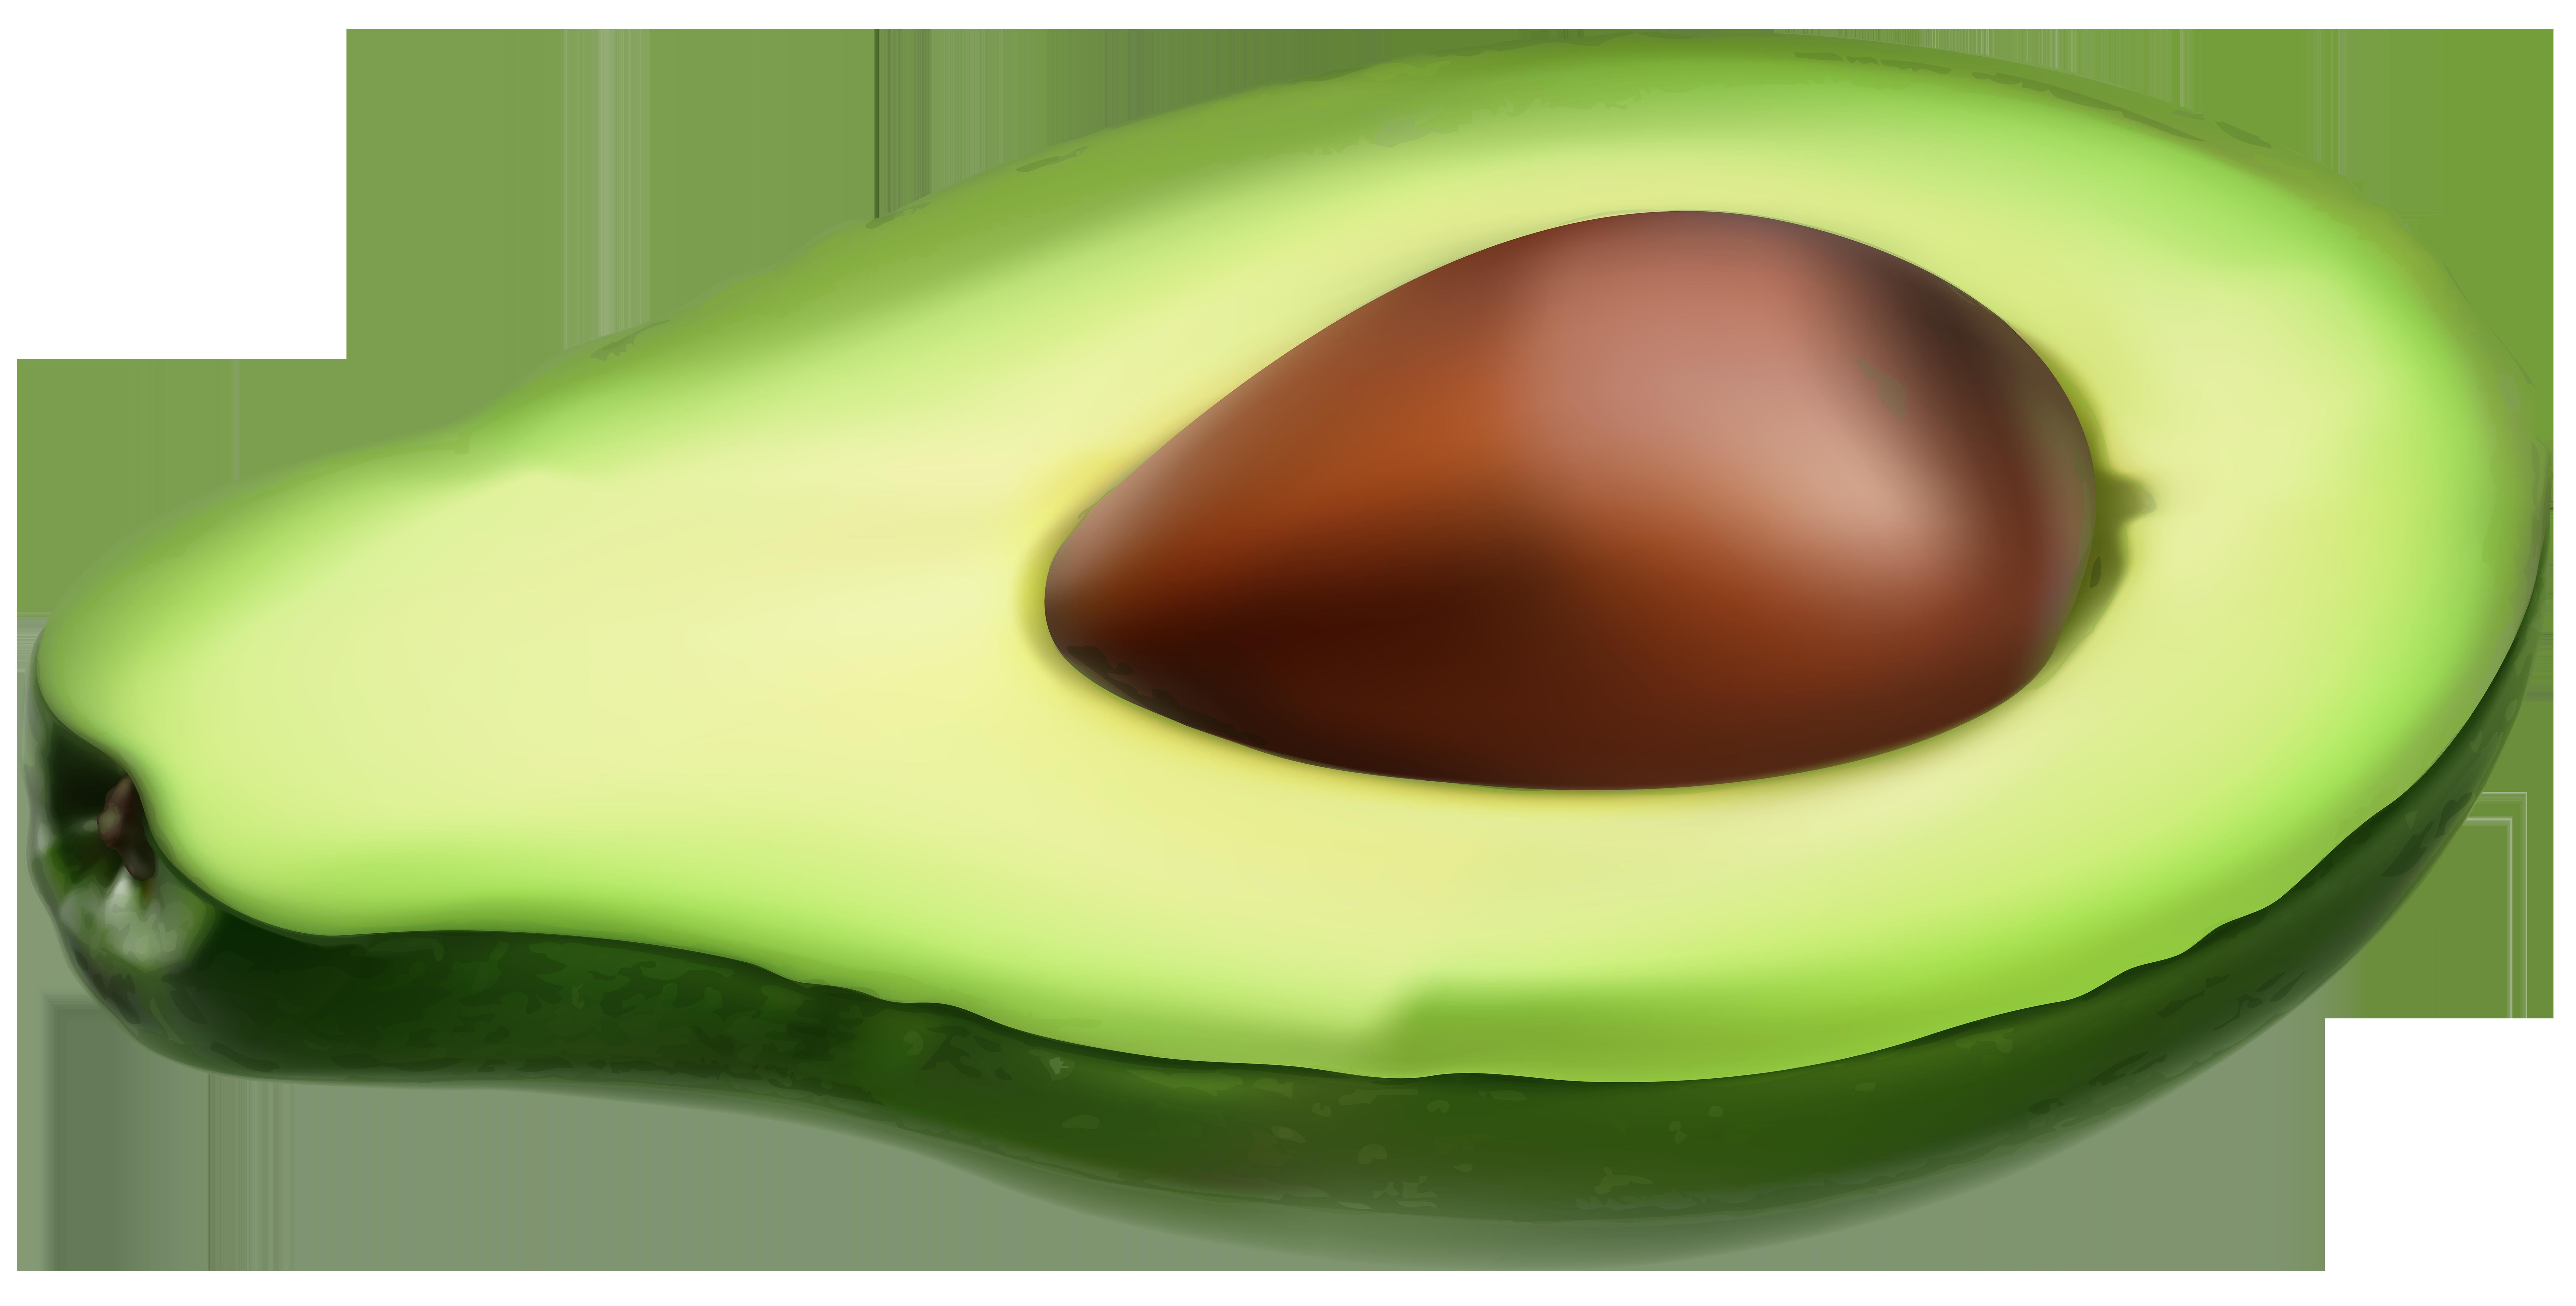 Png clip art image. Avocado clipart avocado half